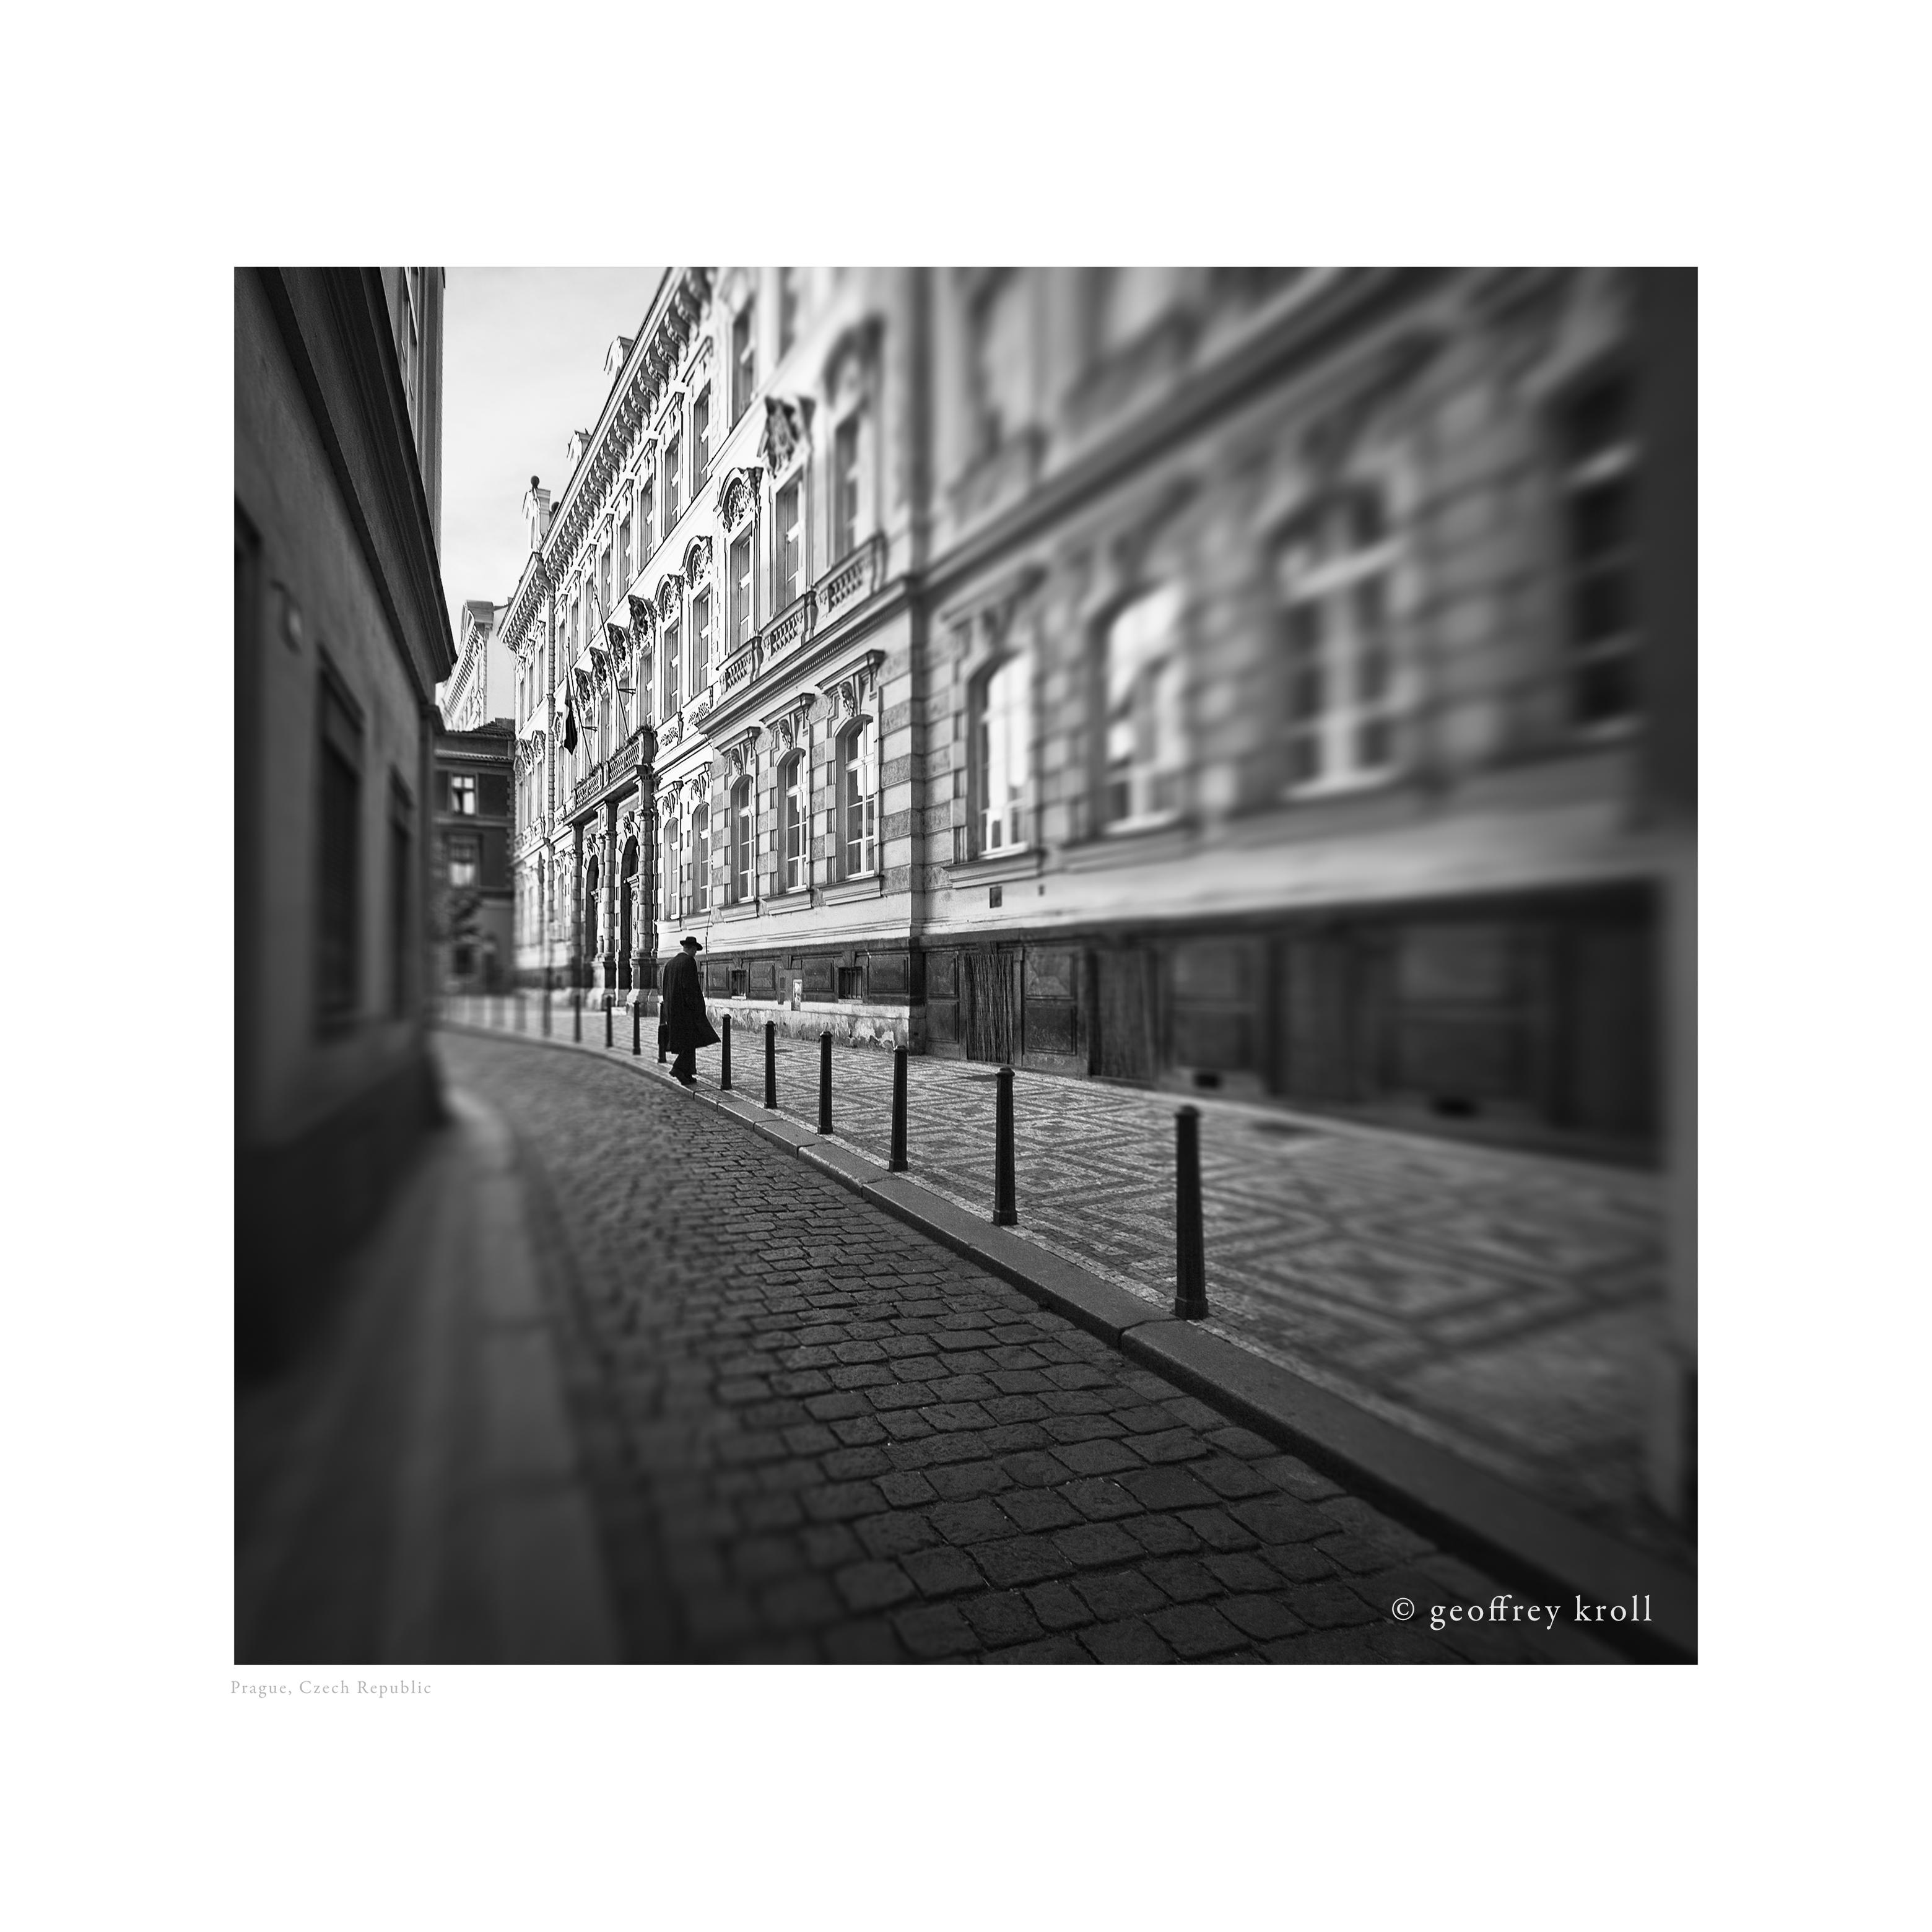 geoffrey kroll, Prague CZ